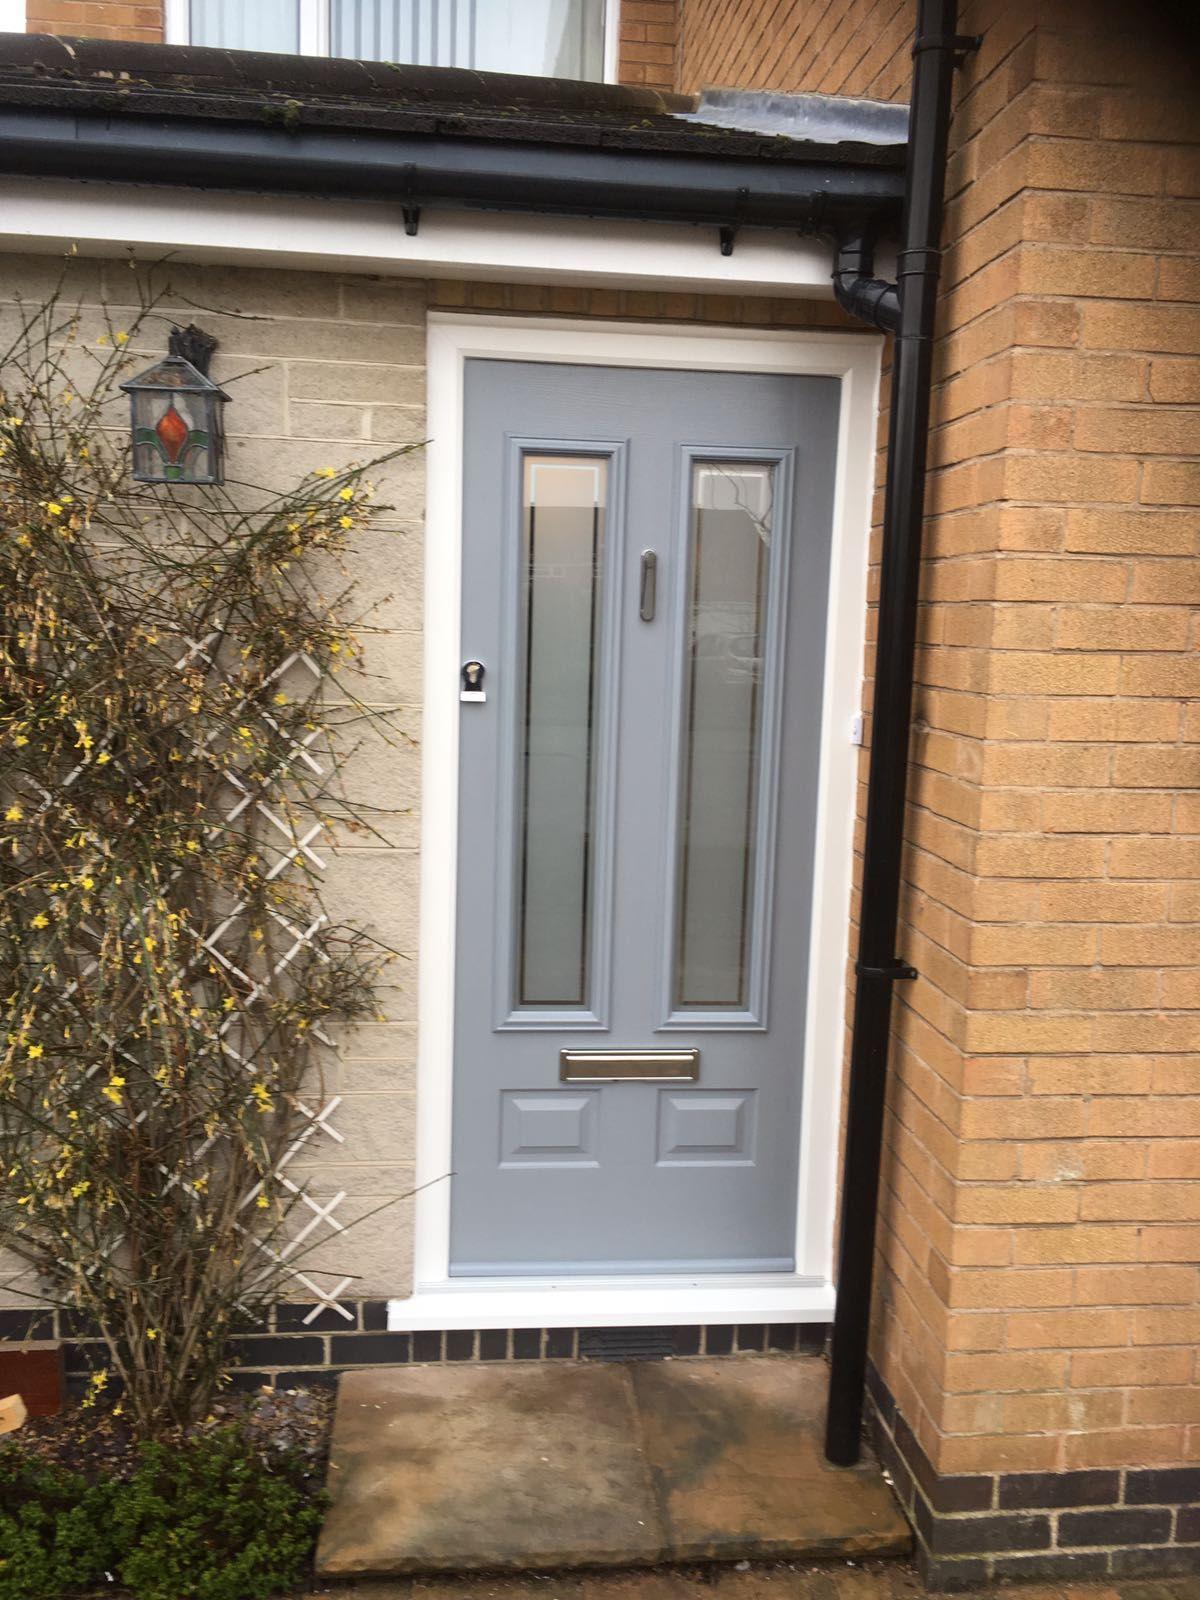 French grey Edinburgh @SolidorLtd Composite Door, satin glass with ...